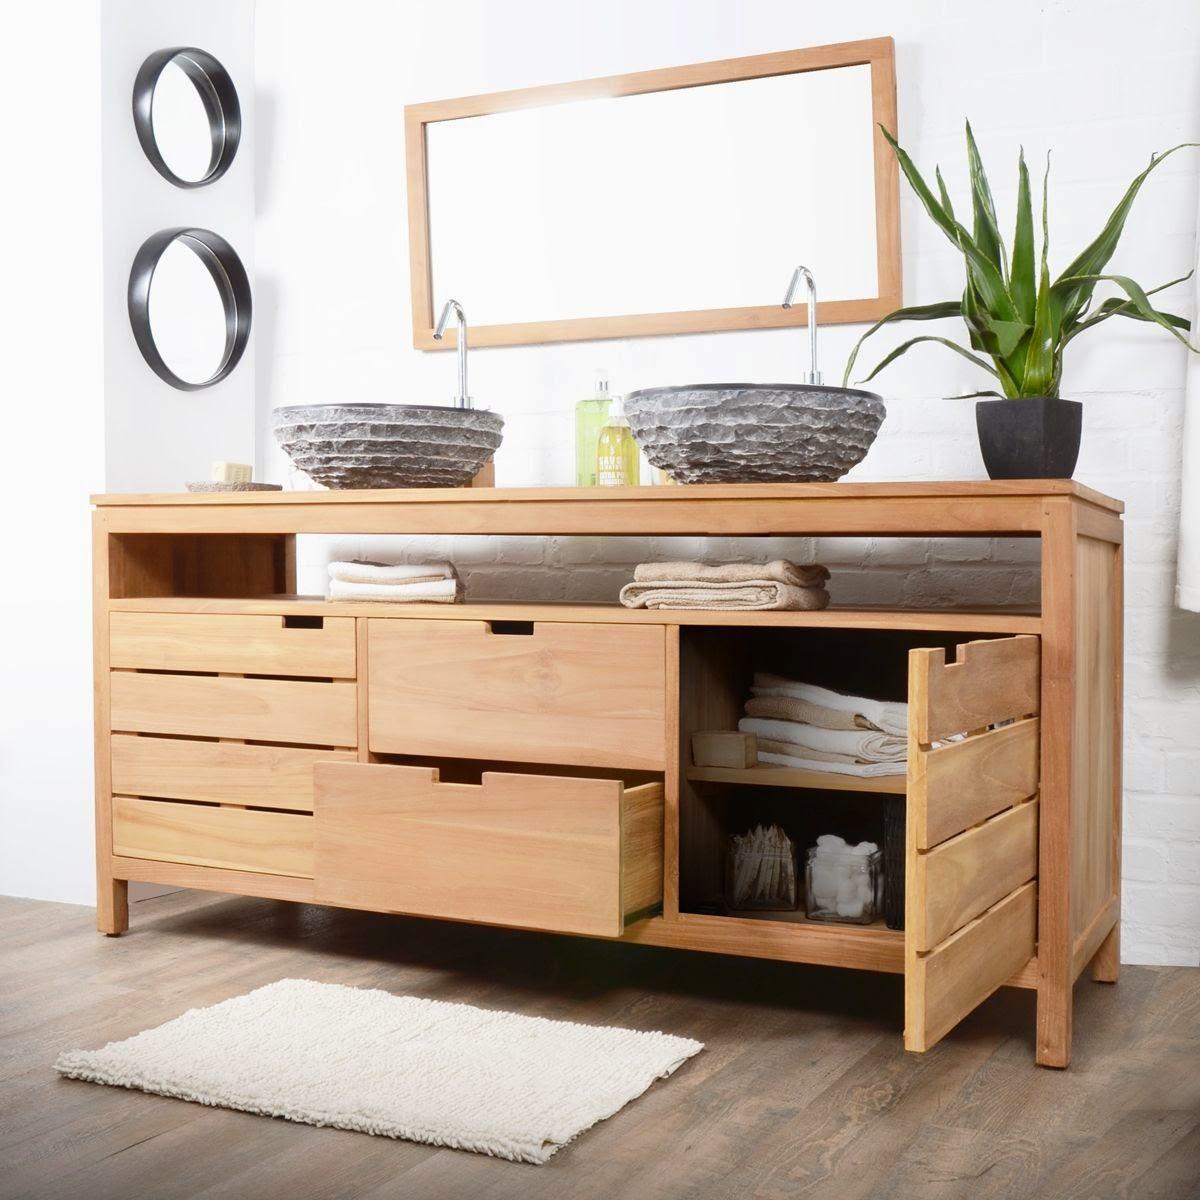 Meuble salle de bain bois 2 vasques meuble d coration maison for Bois pour meuble de salle de bain